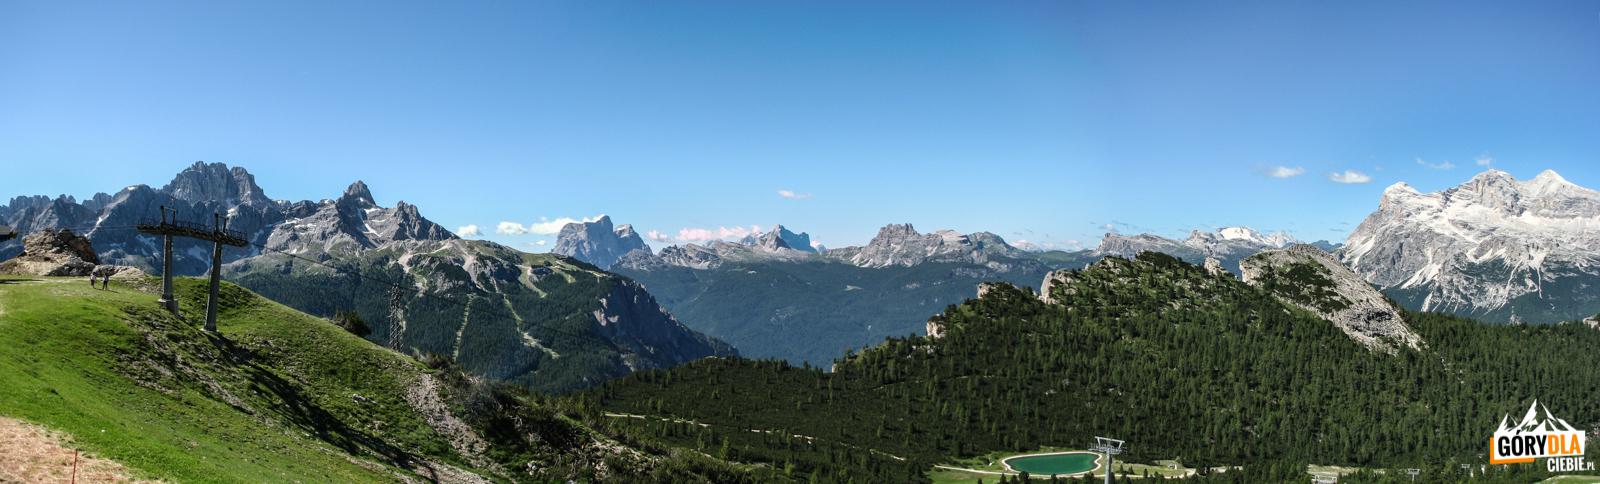 Panoramy otoczenia Cortiny d'Ampezzo